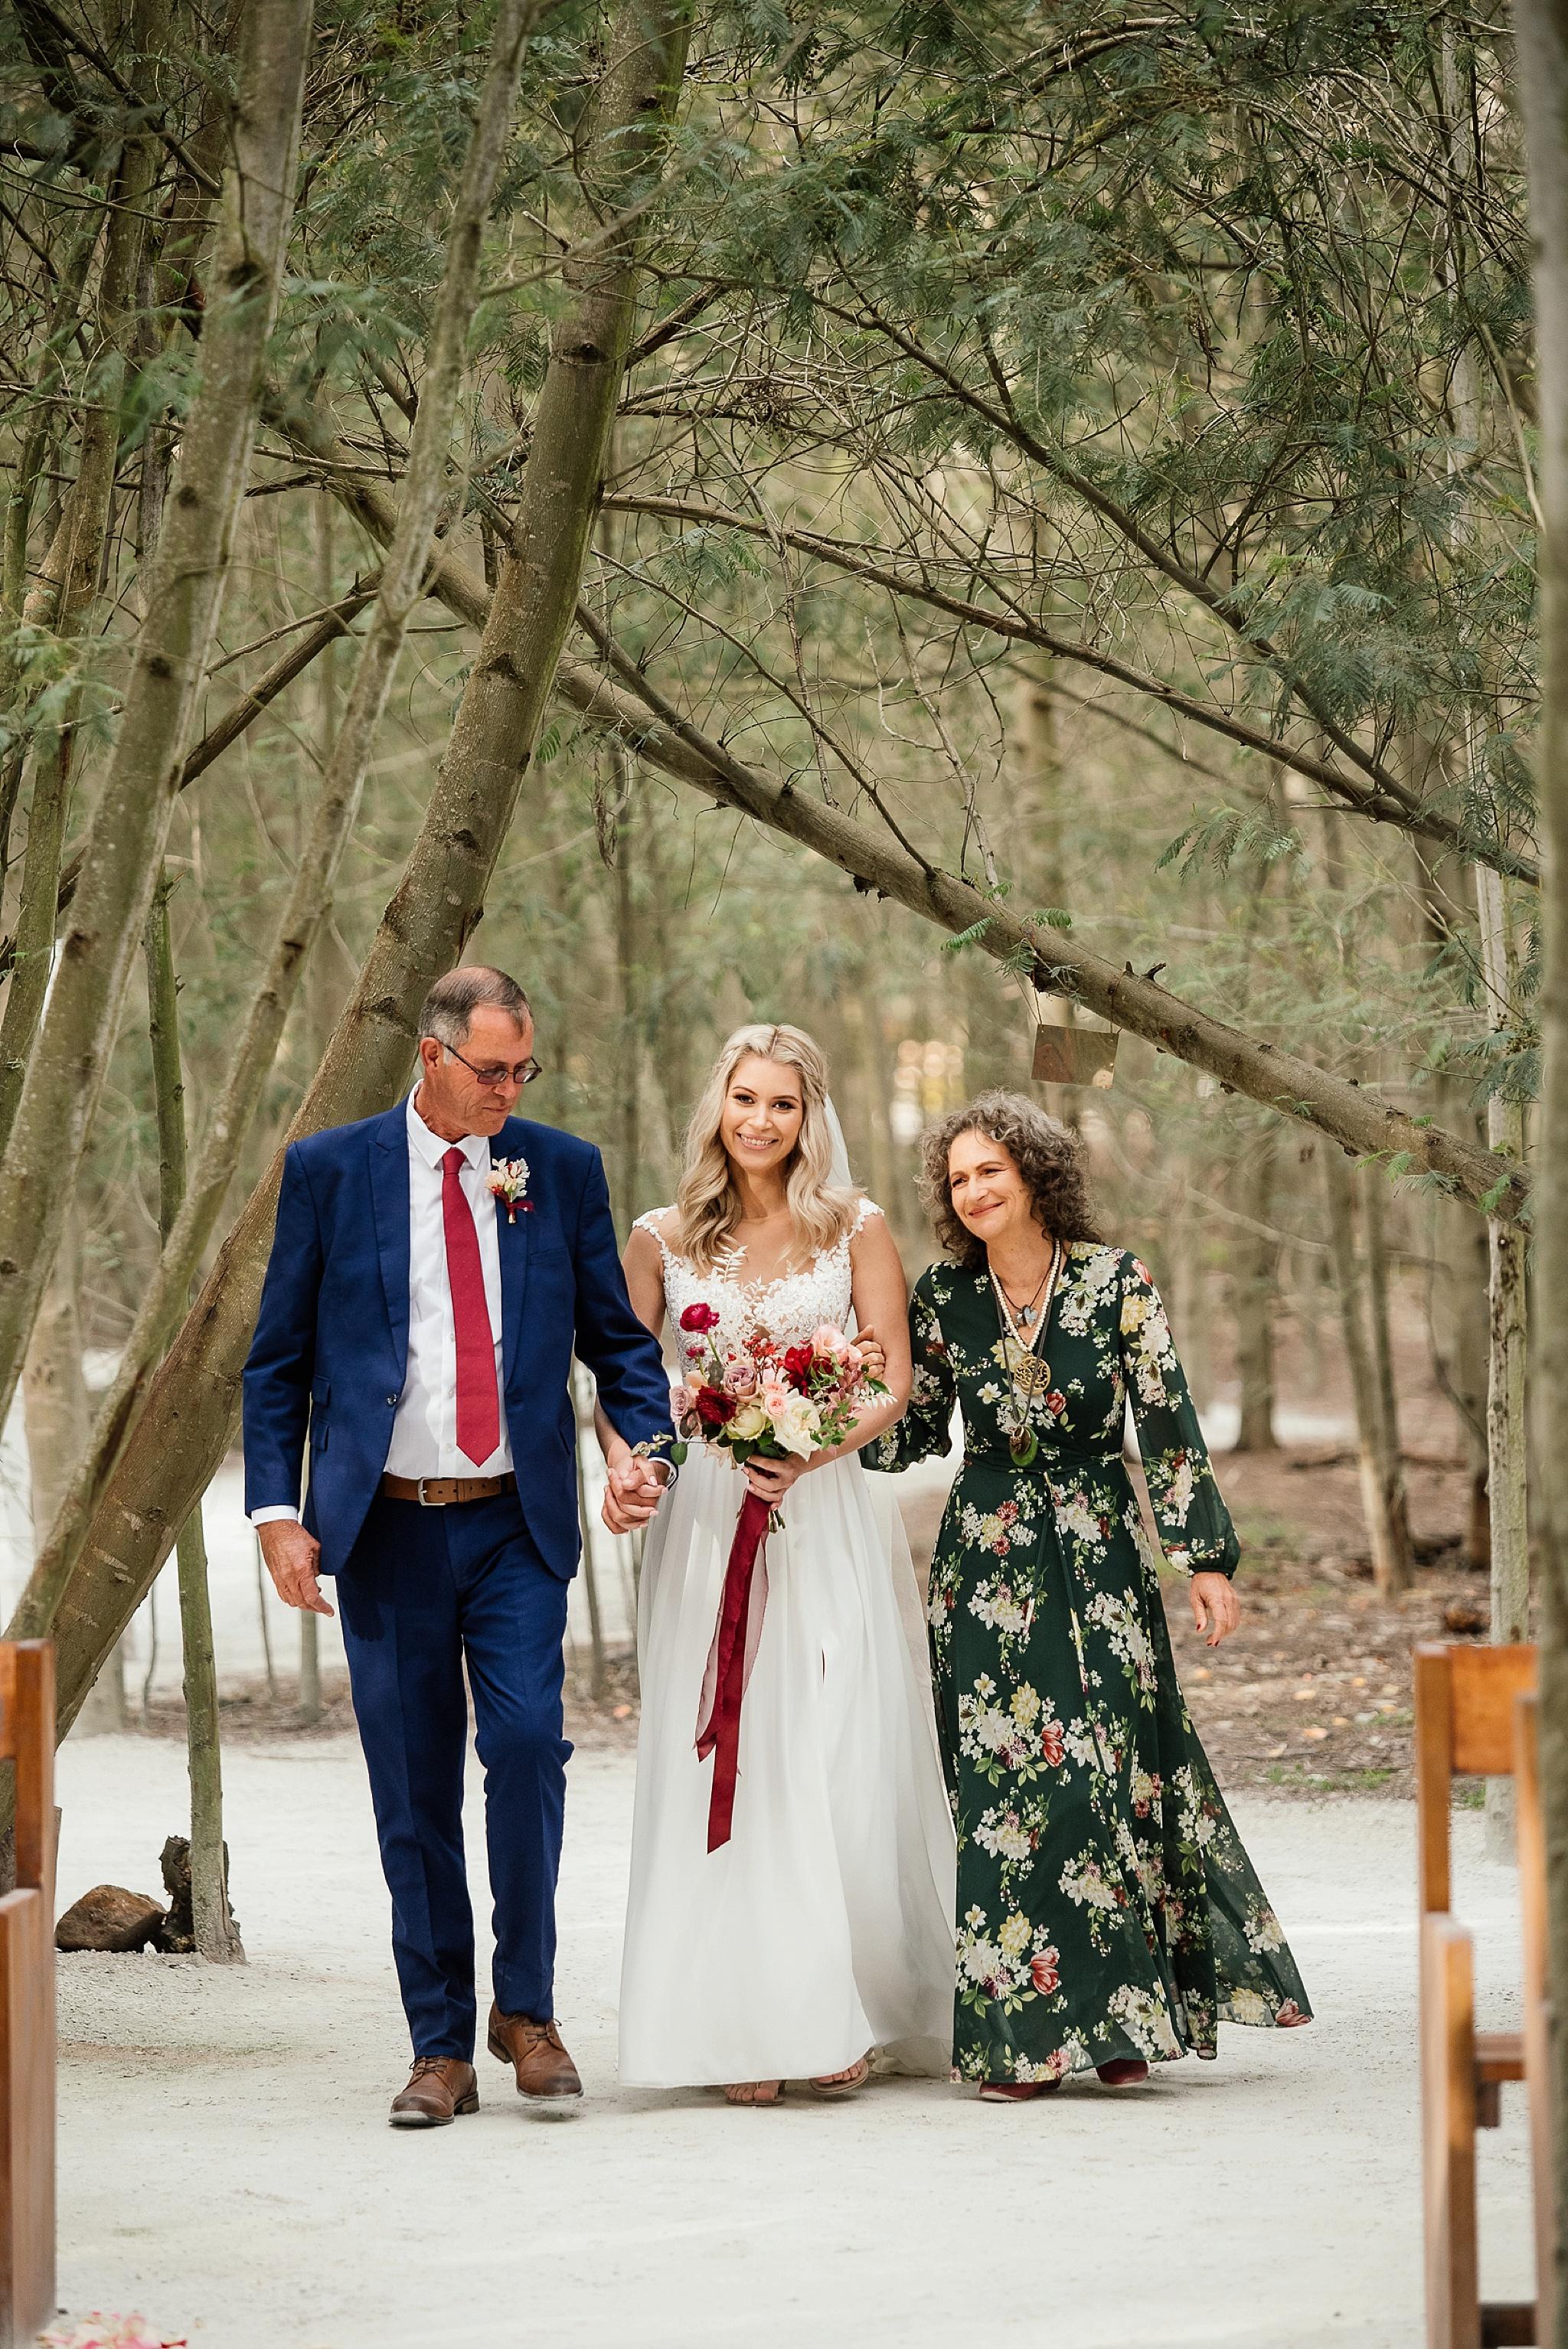 Cape Town Photographer Darren Bester - Die Woud Wedding - Gareth & Roxanne_0069.jpg